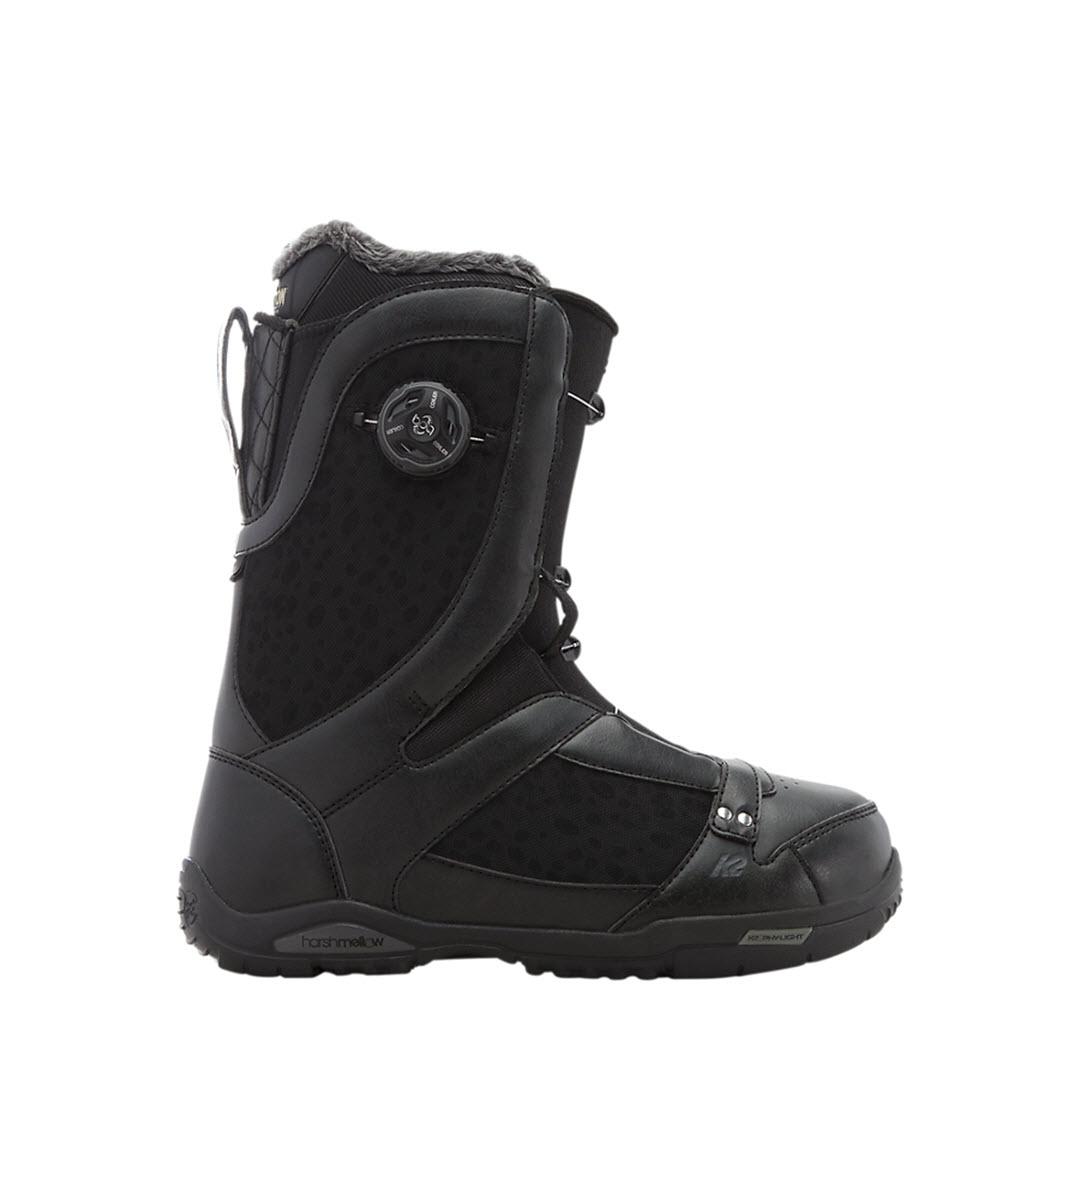 K2 Sapera Womens Snowboard Boots 2017 Black UK 5